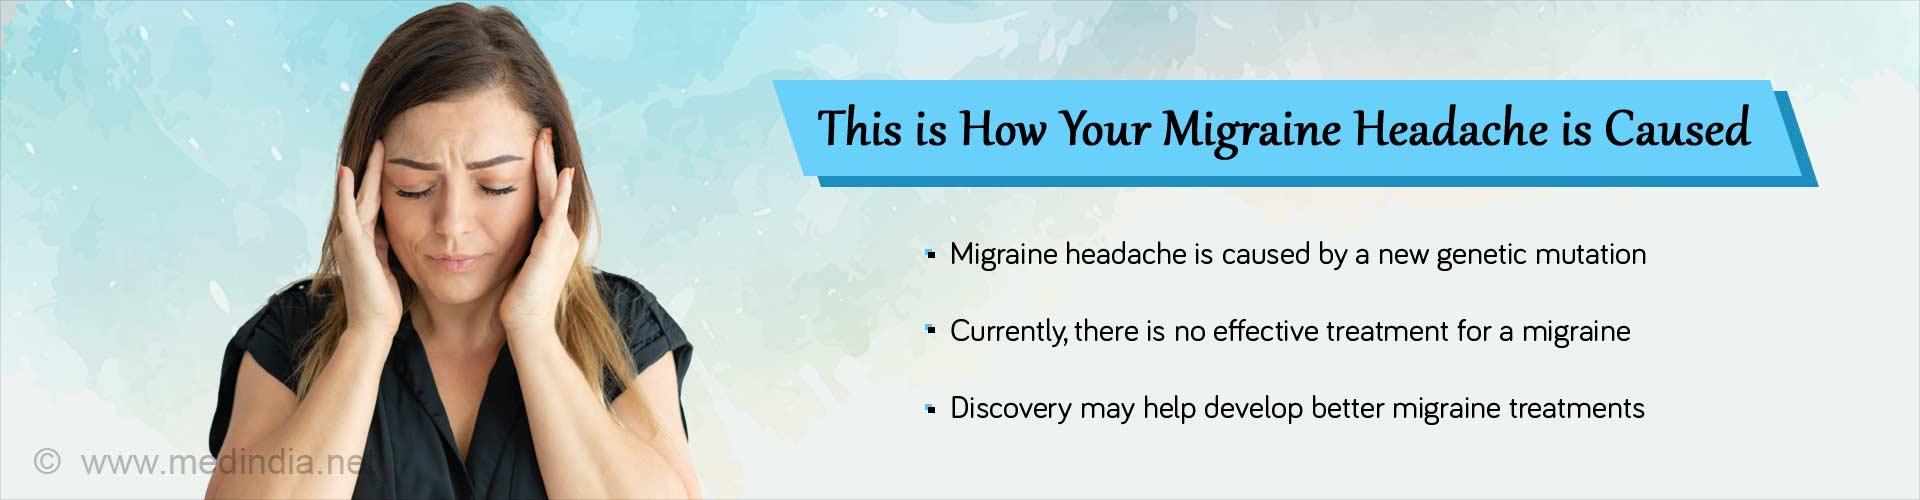 New Genetic Mechanism Underlying Migraines Discovered